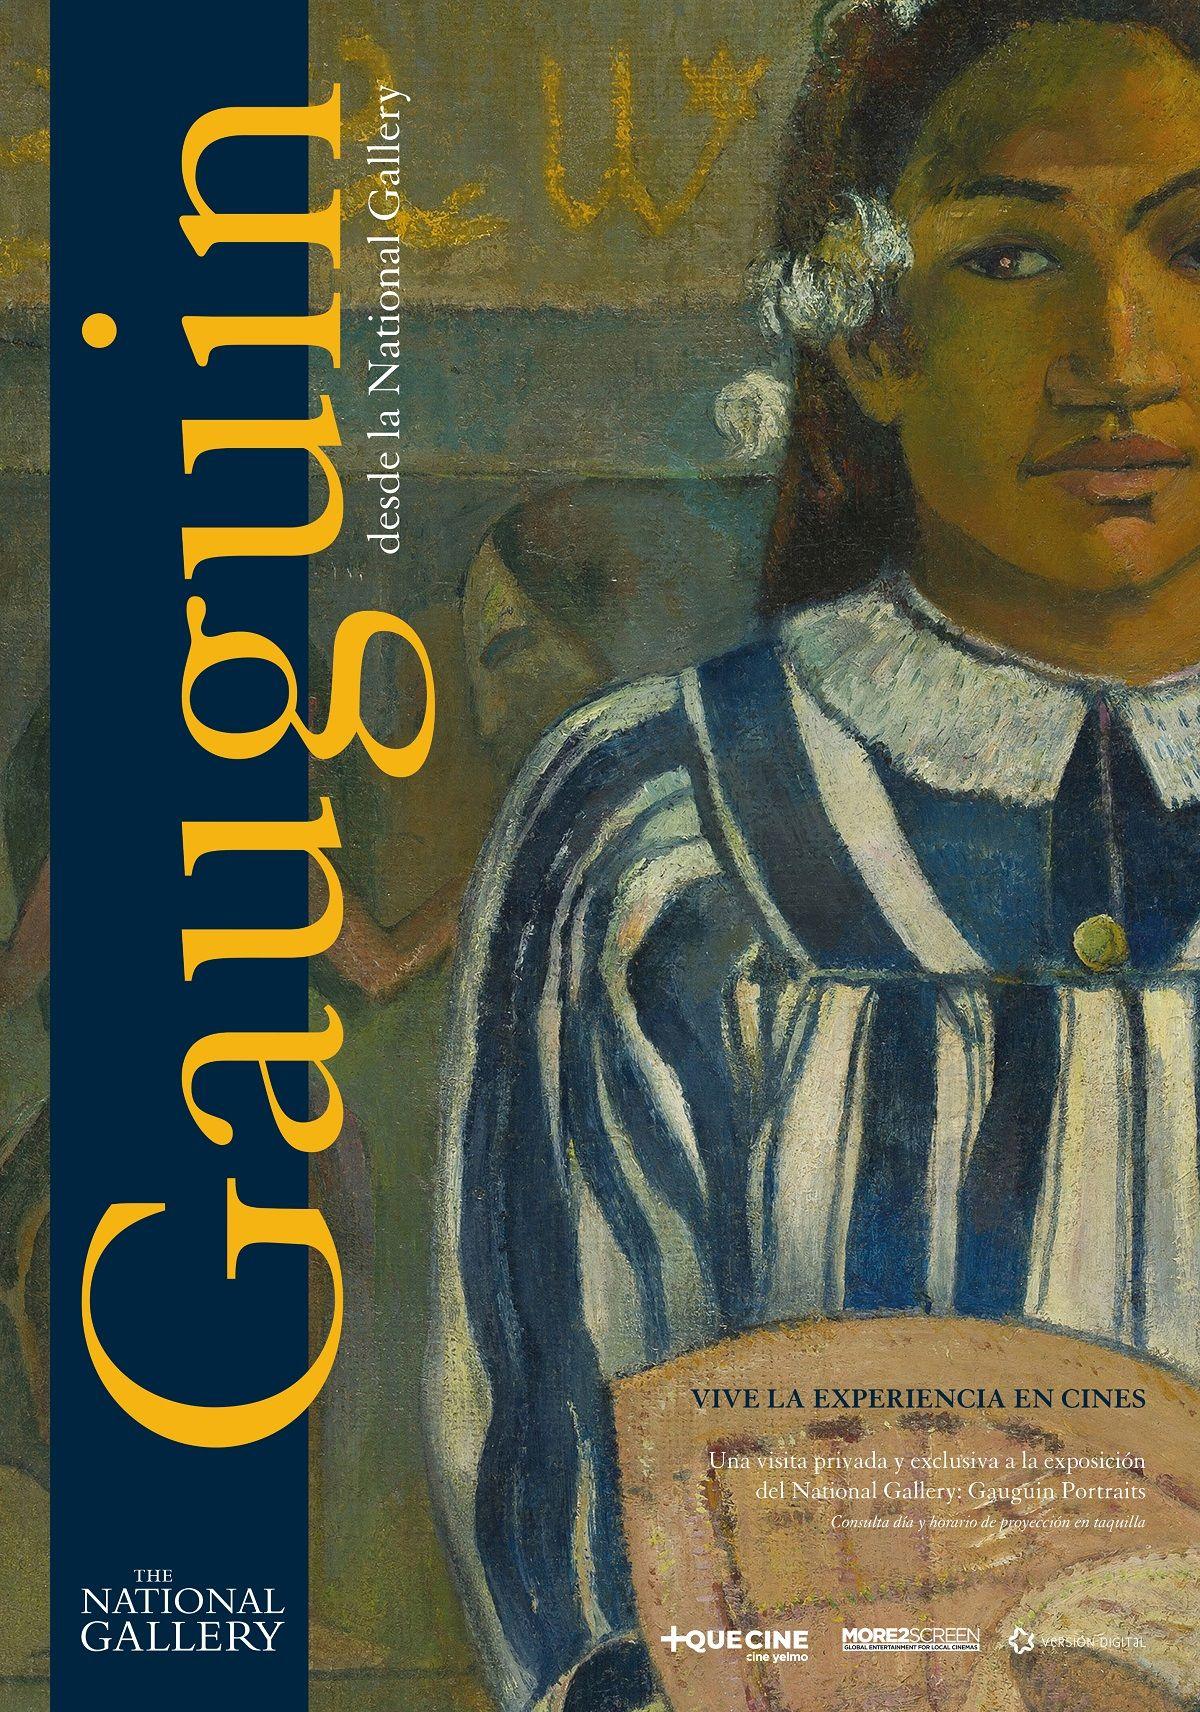 cartel imprenta gauguin 1